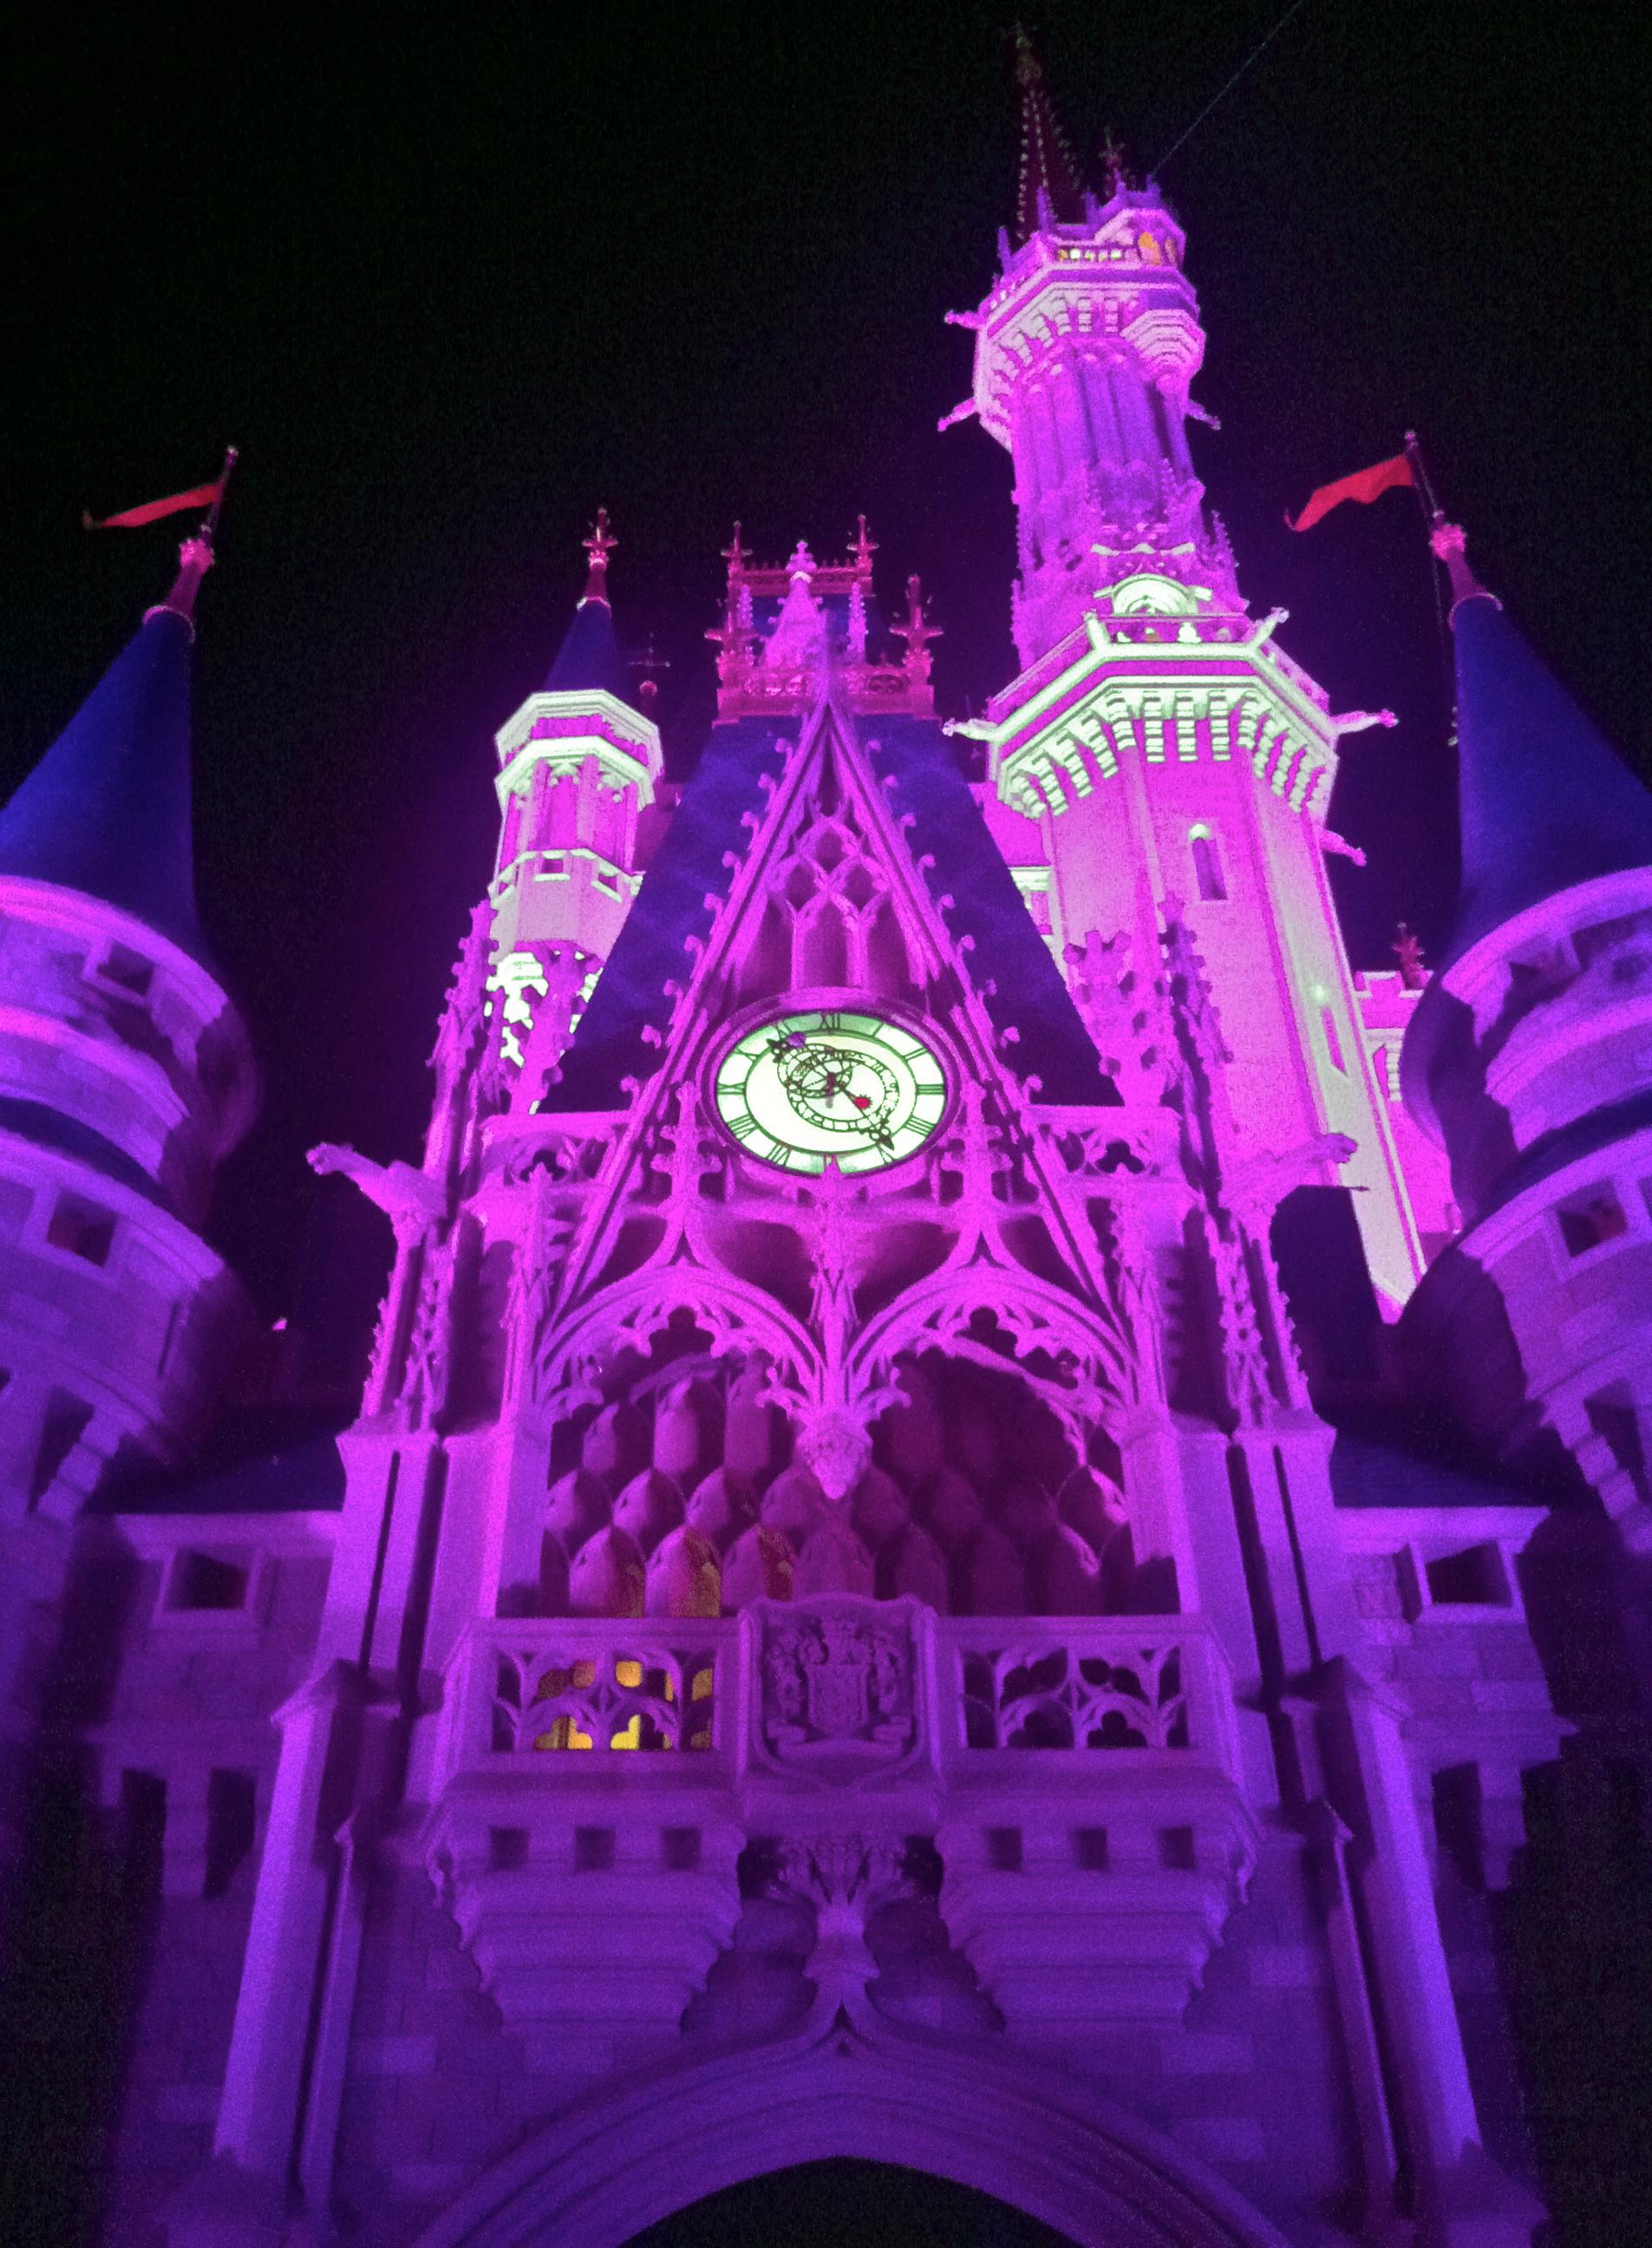 fileviolet castle panoramiojpg